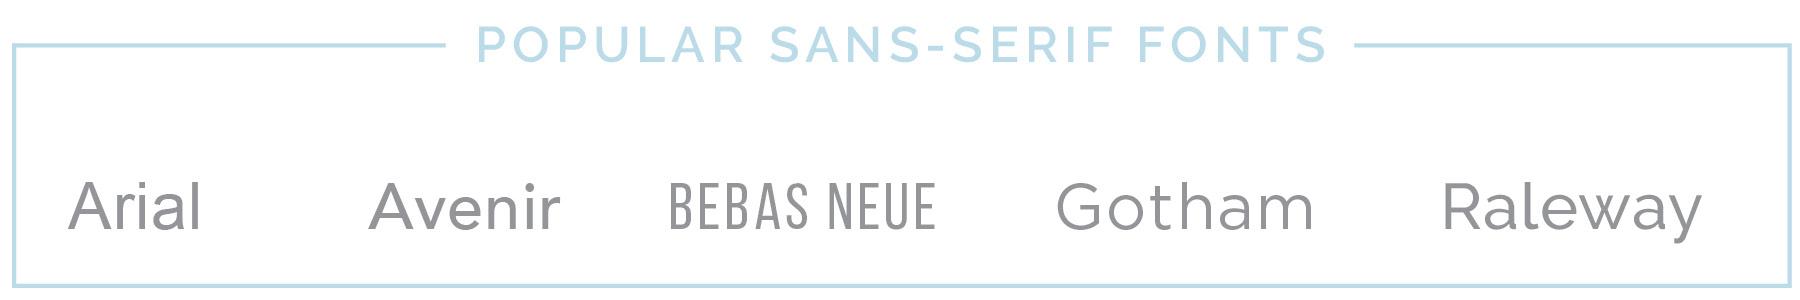 Popular Sans-serif fonts | casilong.com #casilongdesign